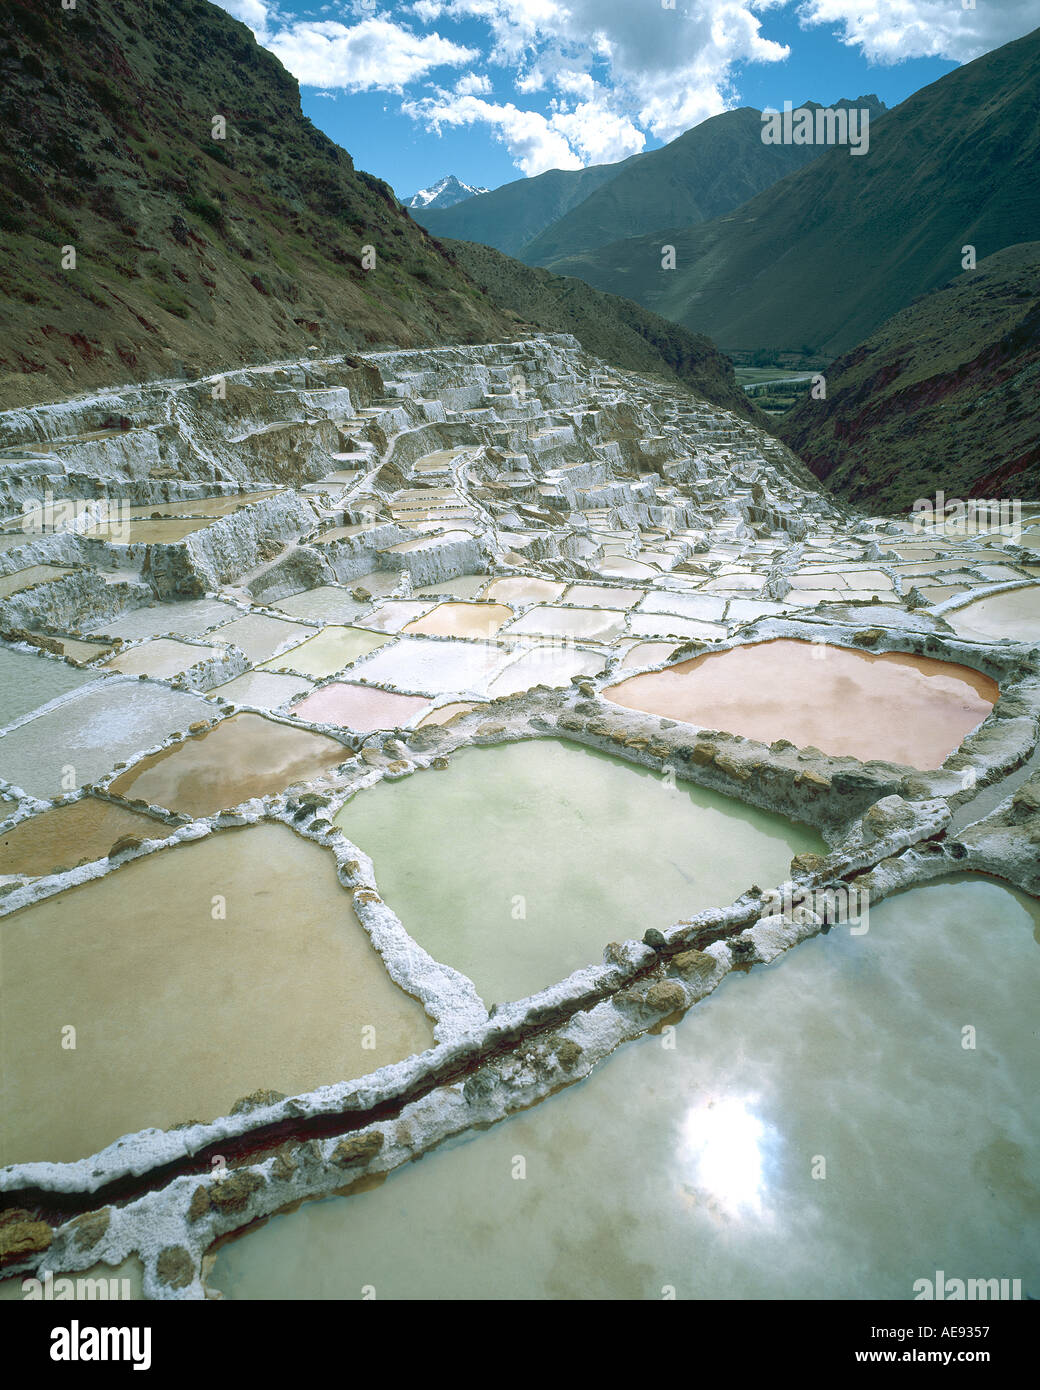 Mountain living near cusco peru royalty free stock photo - Maras Salt Mine In The Andes Mountains Near Cuzco Peru